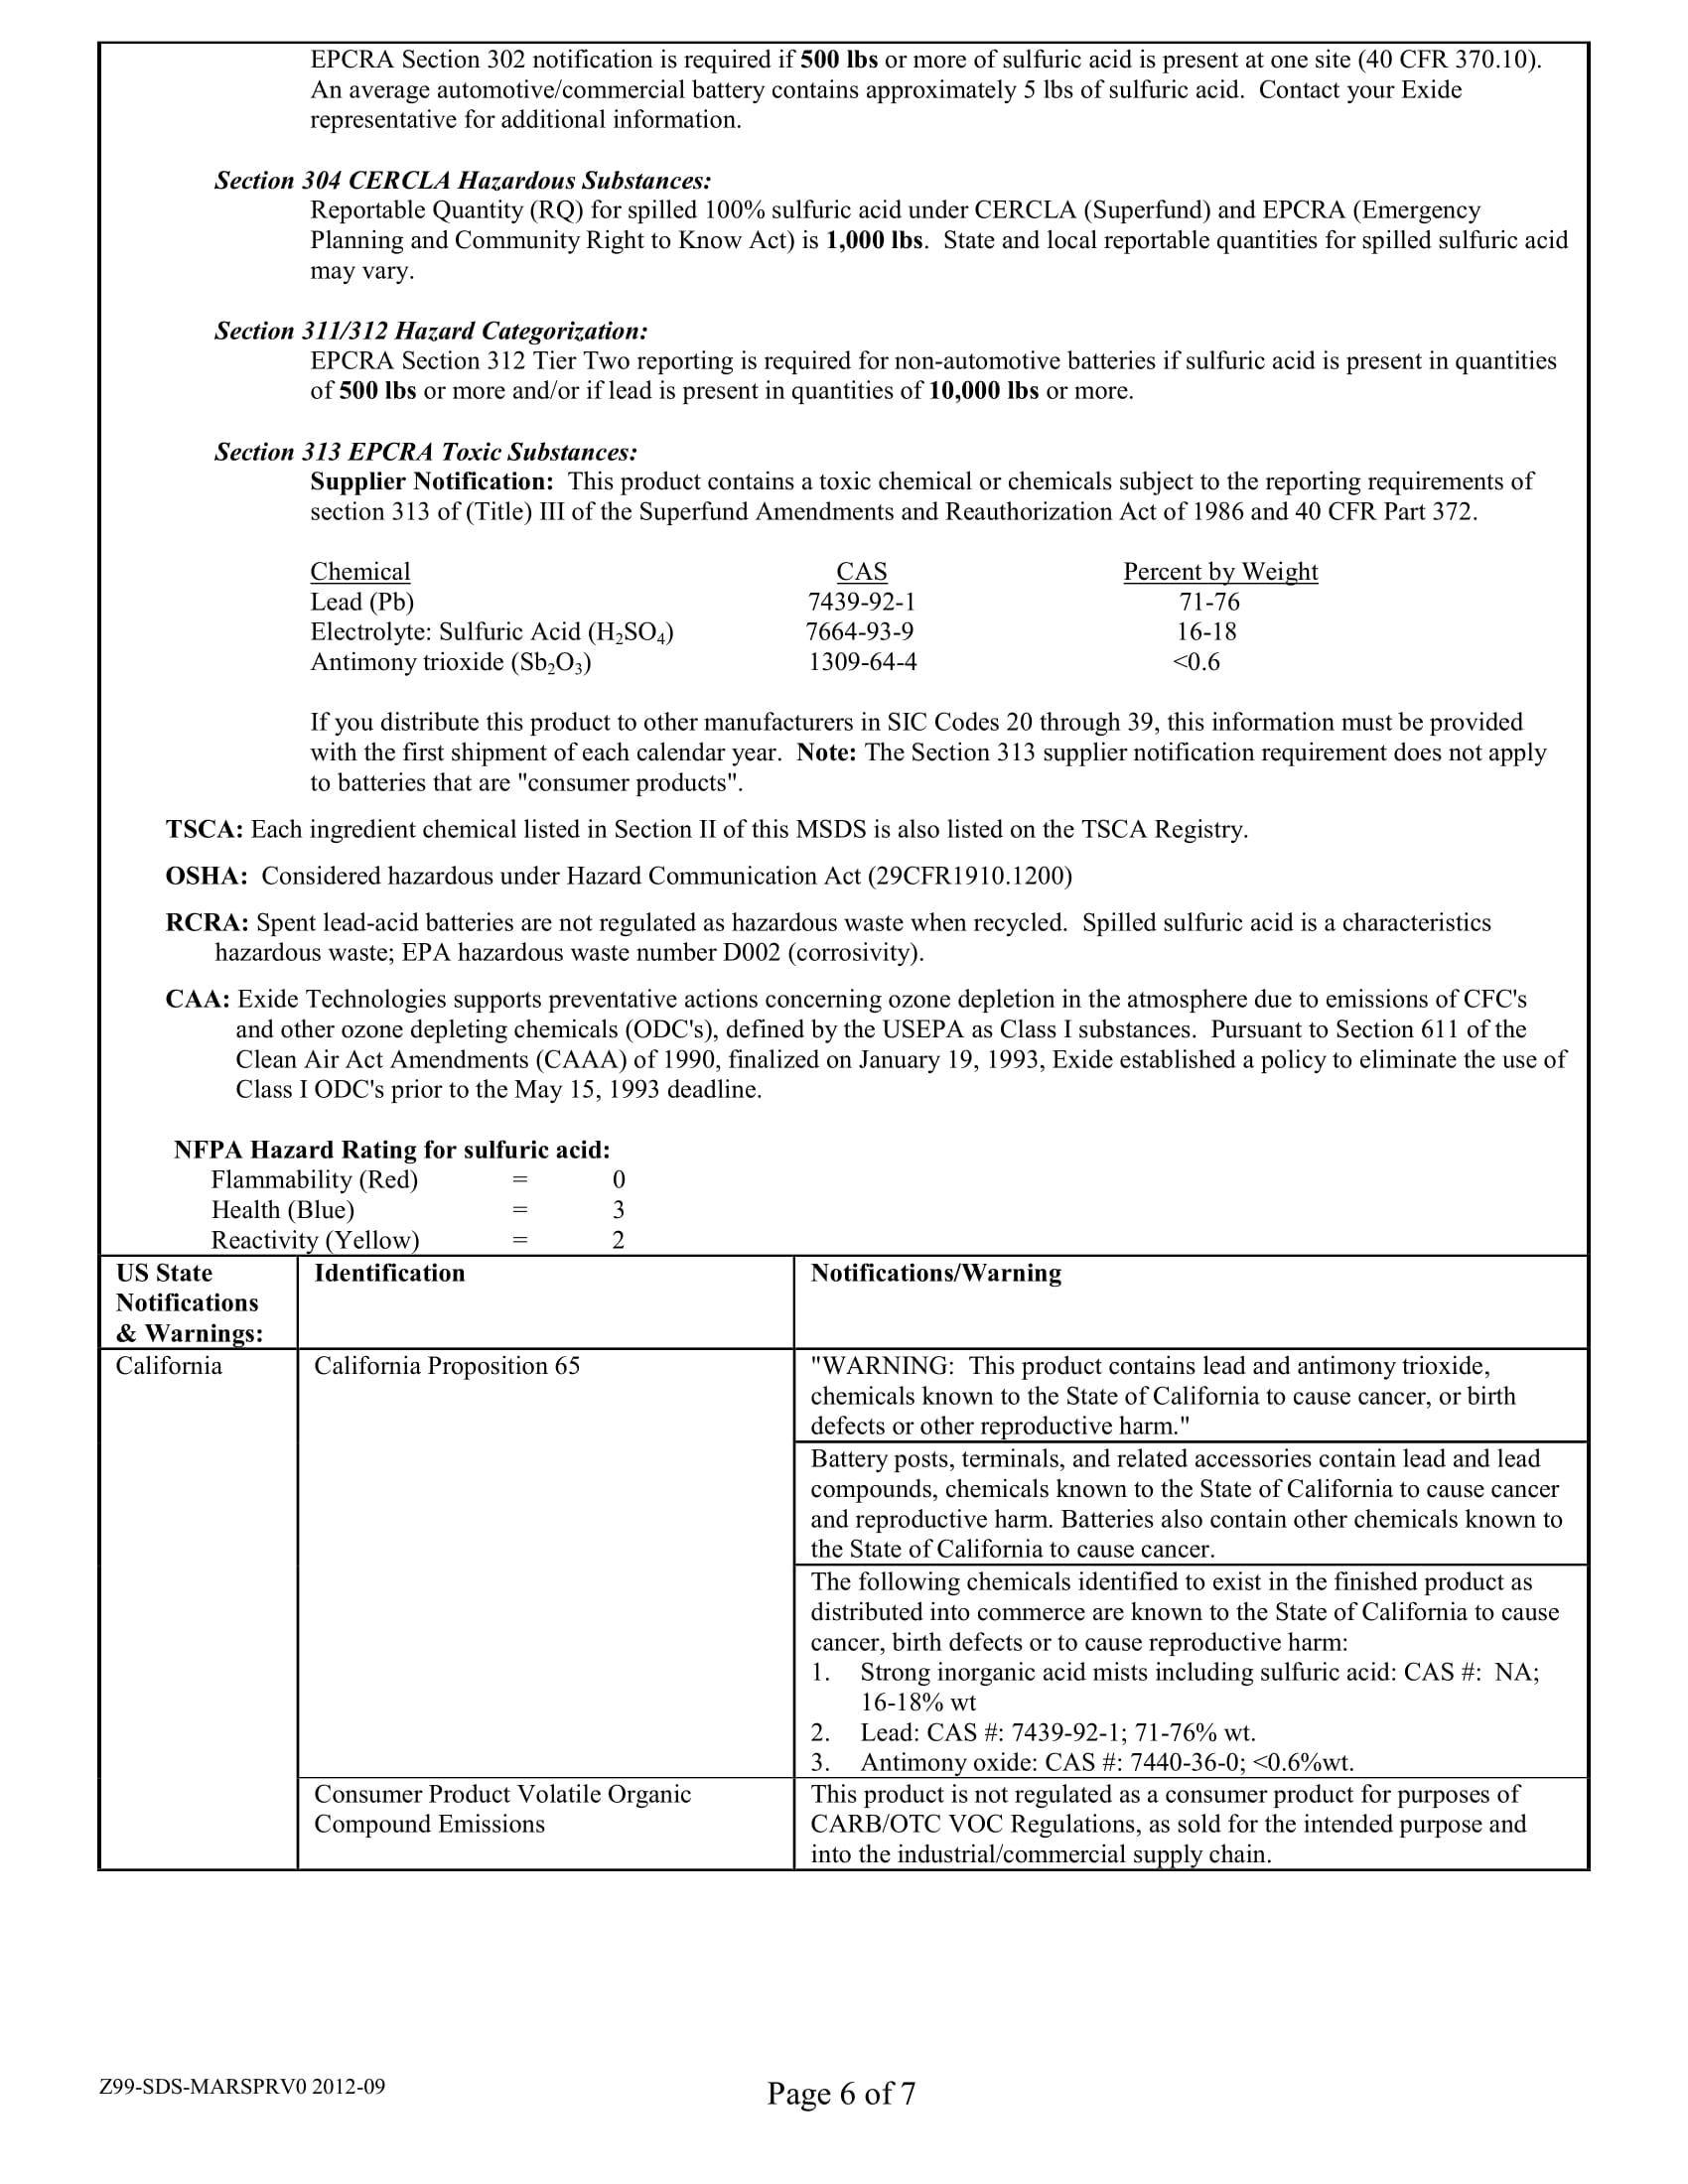 Marathon Battery Safety Data Sheet 6